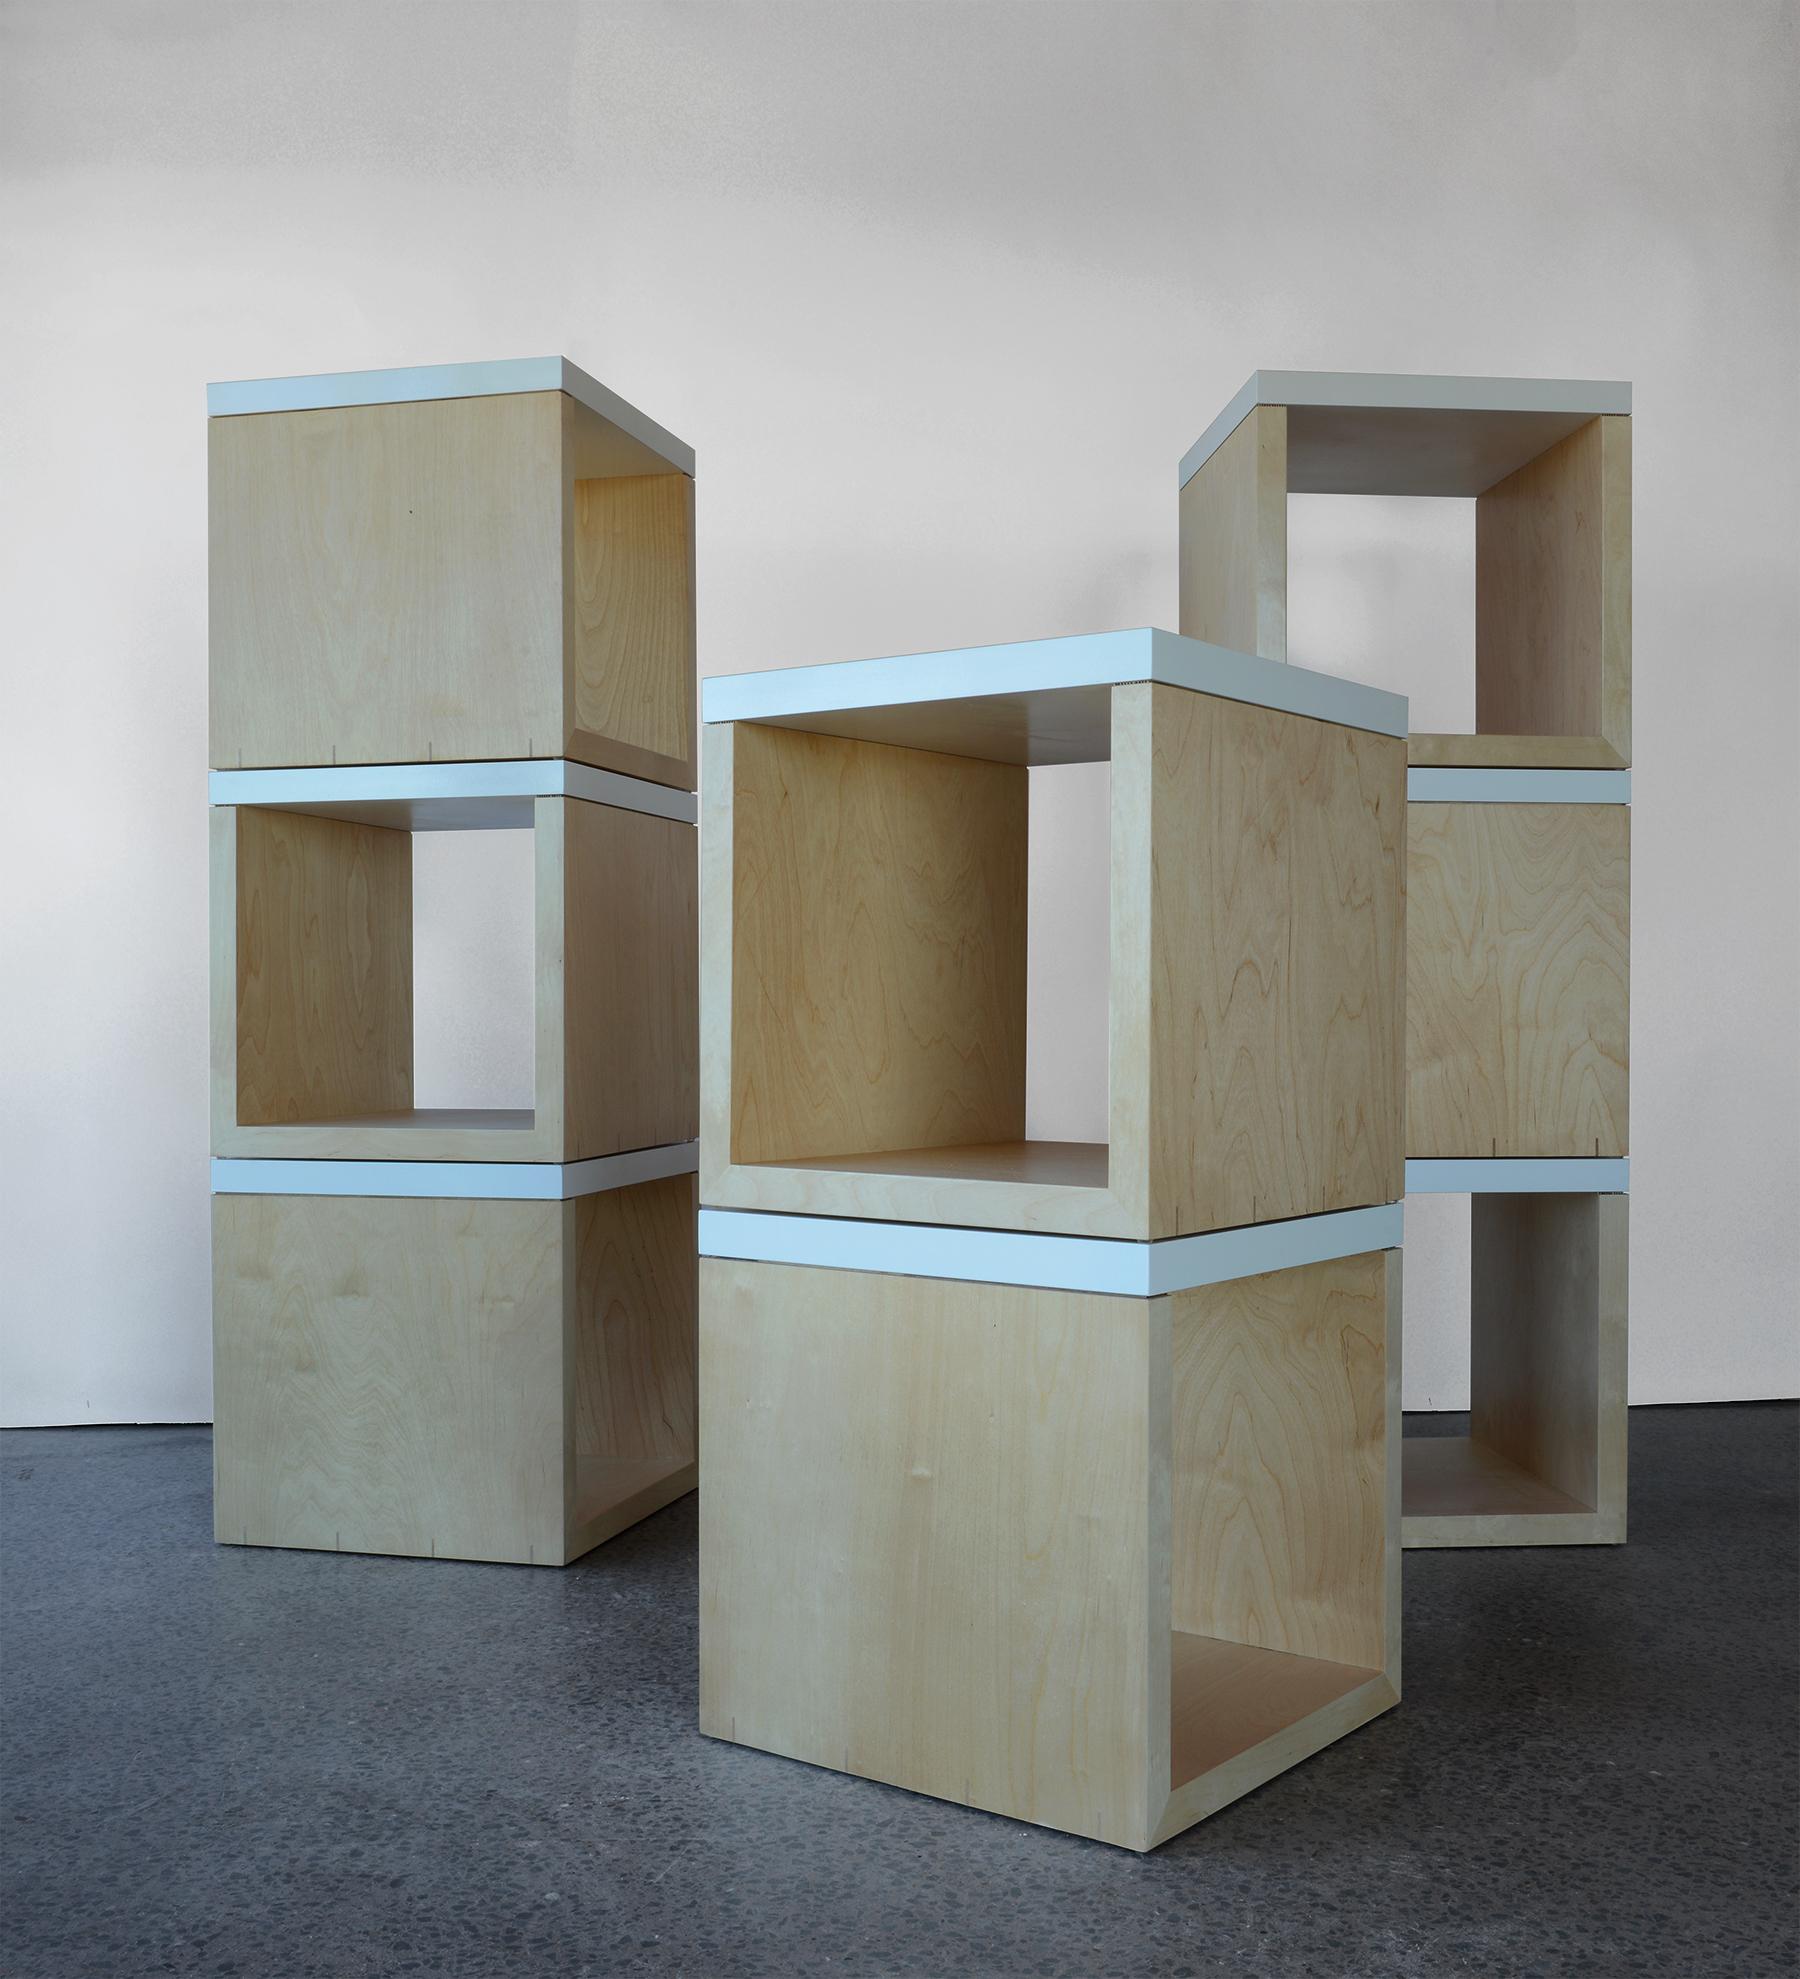 cubes_1_small.jpg